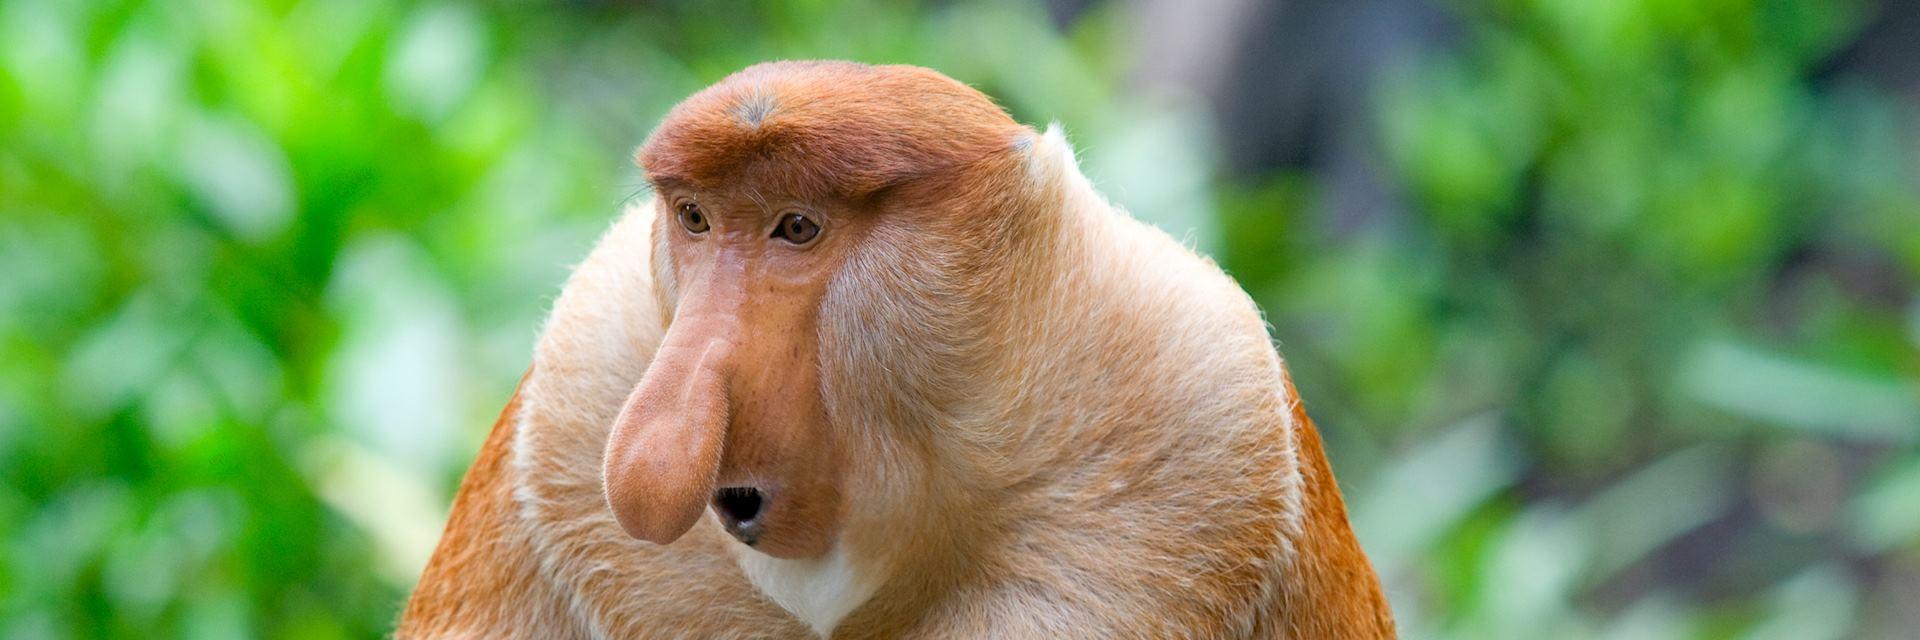 Proboscis monkey in the Garama Wetlands